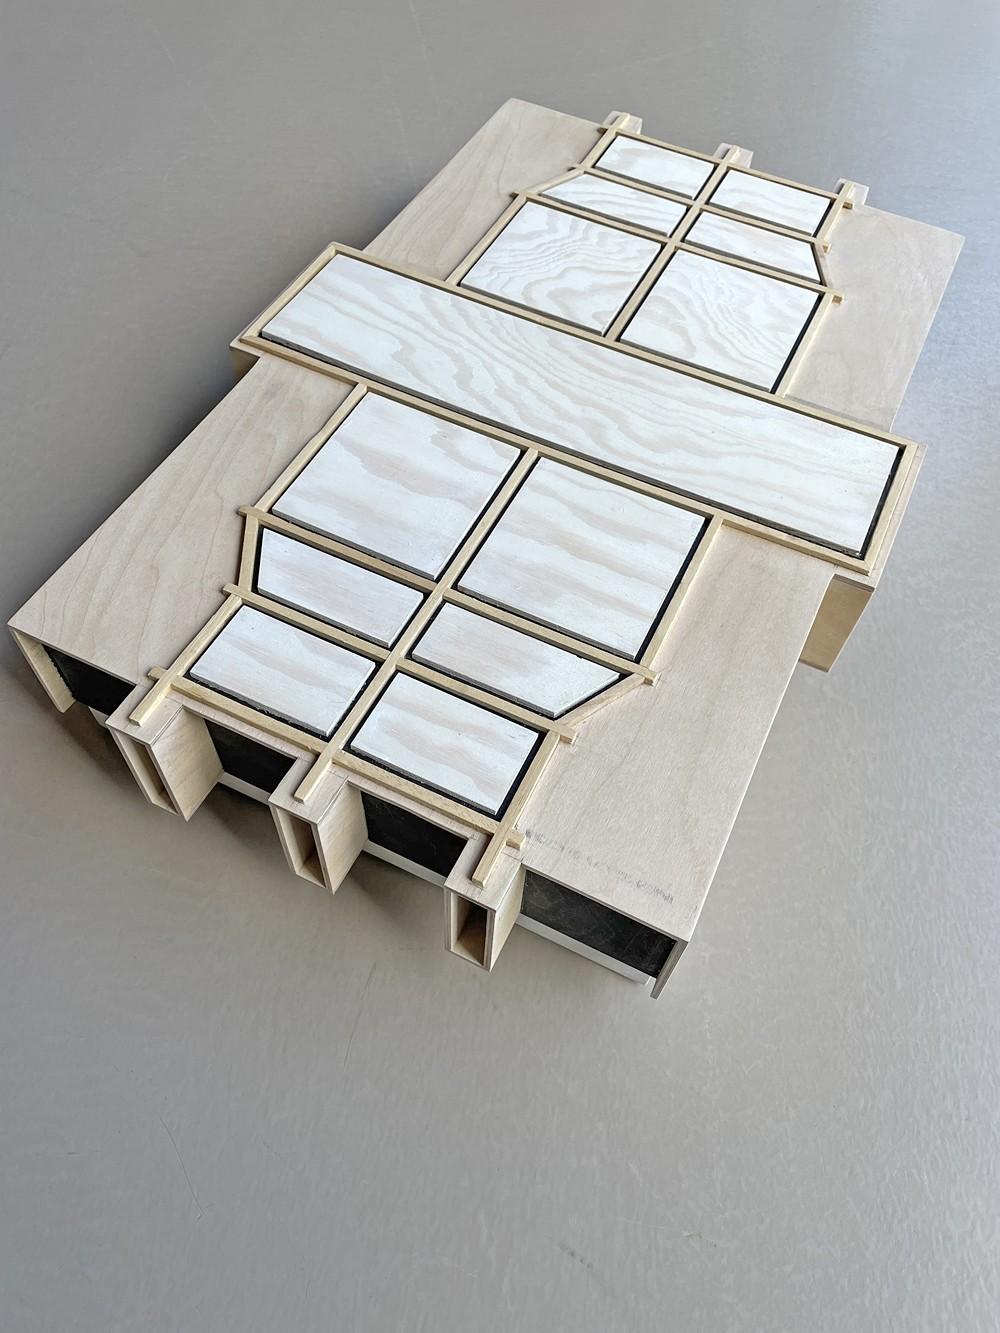 Studio-Frank-Havermans-Liber-Amicorum-Box-ZIN_6